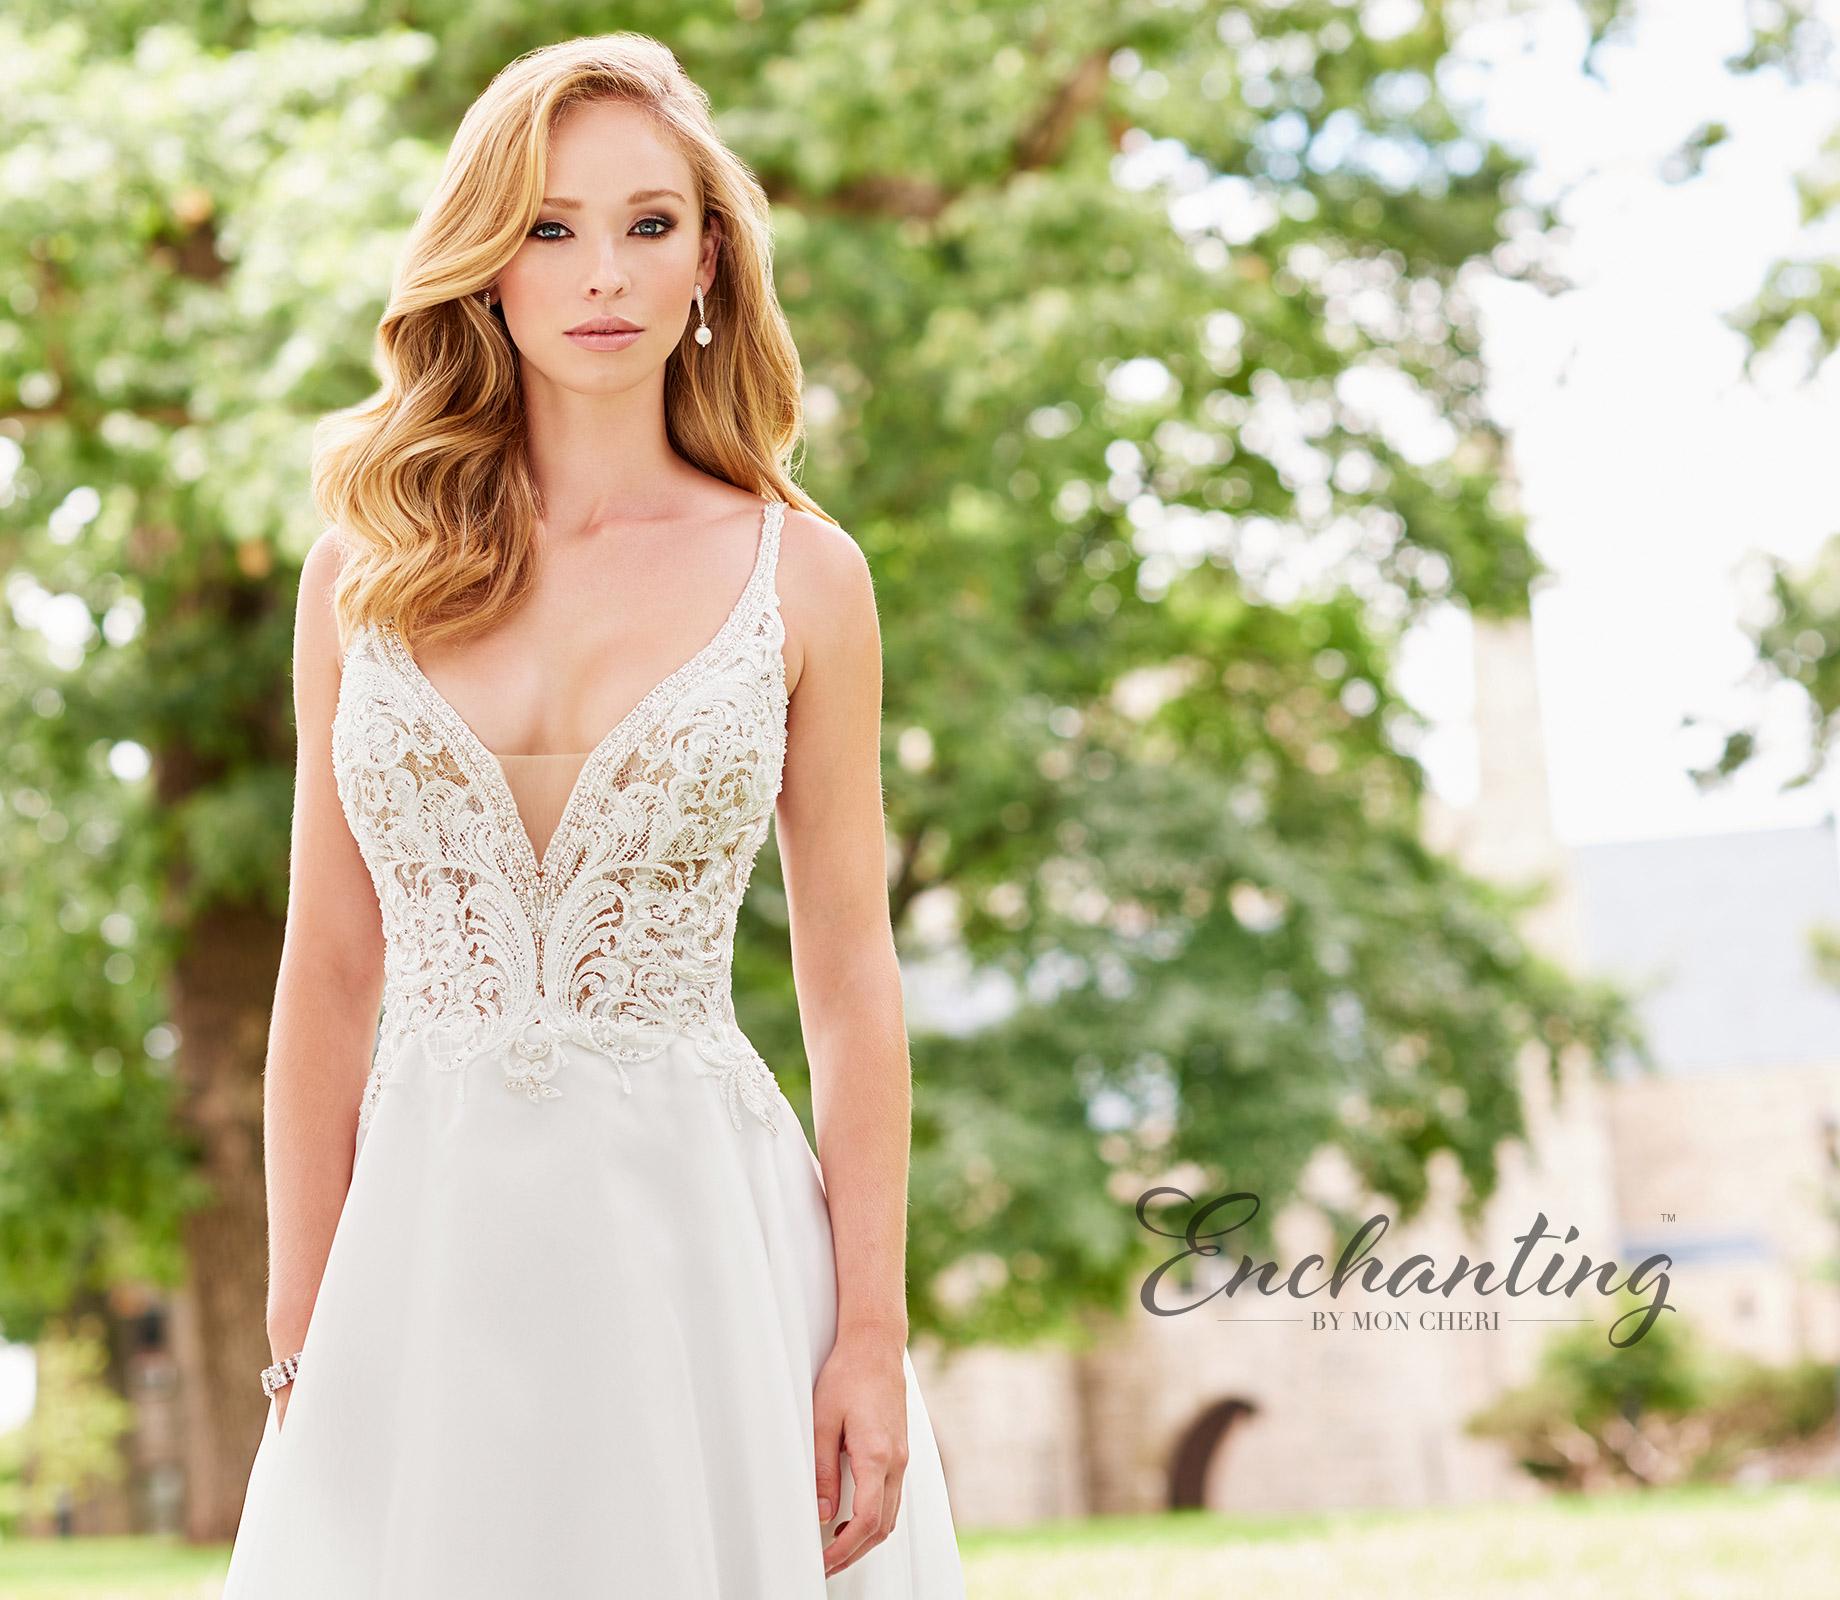 sexy-wedding-dress-Enchanting-118137_C